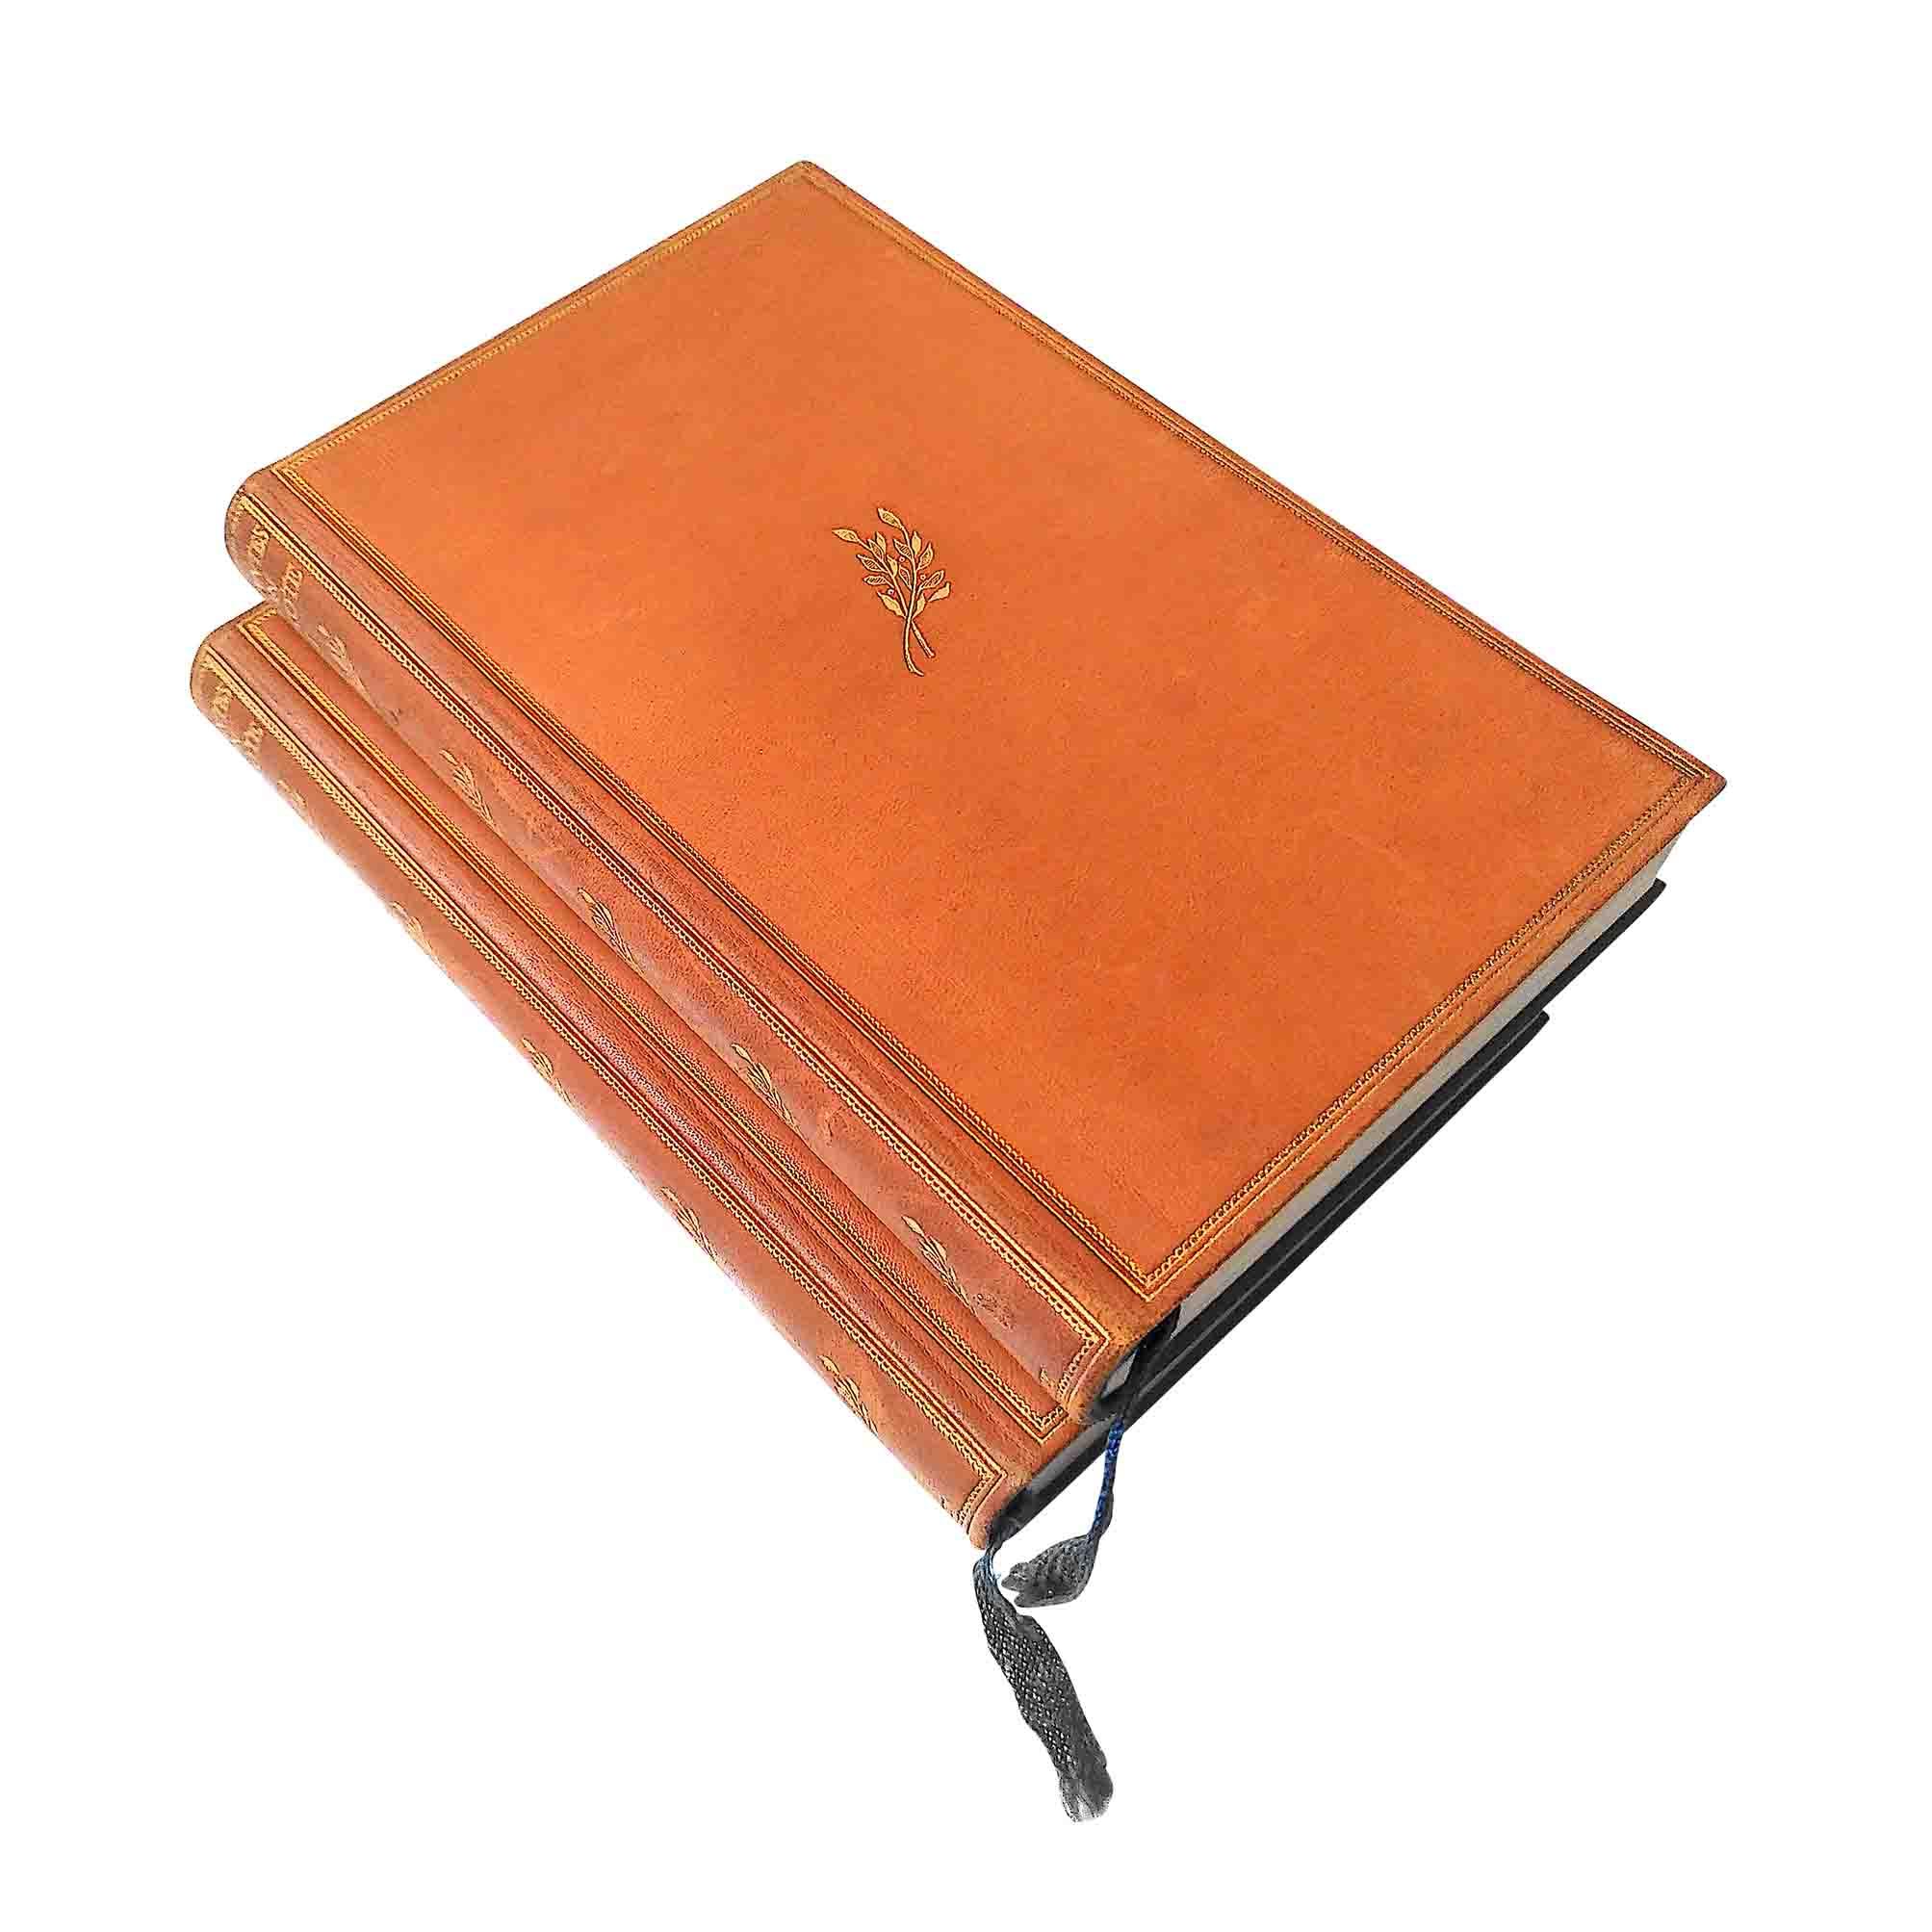 6019 Cervantes Don Quixote Insel Leder 1924 Einbände Rücken frei A N